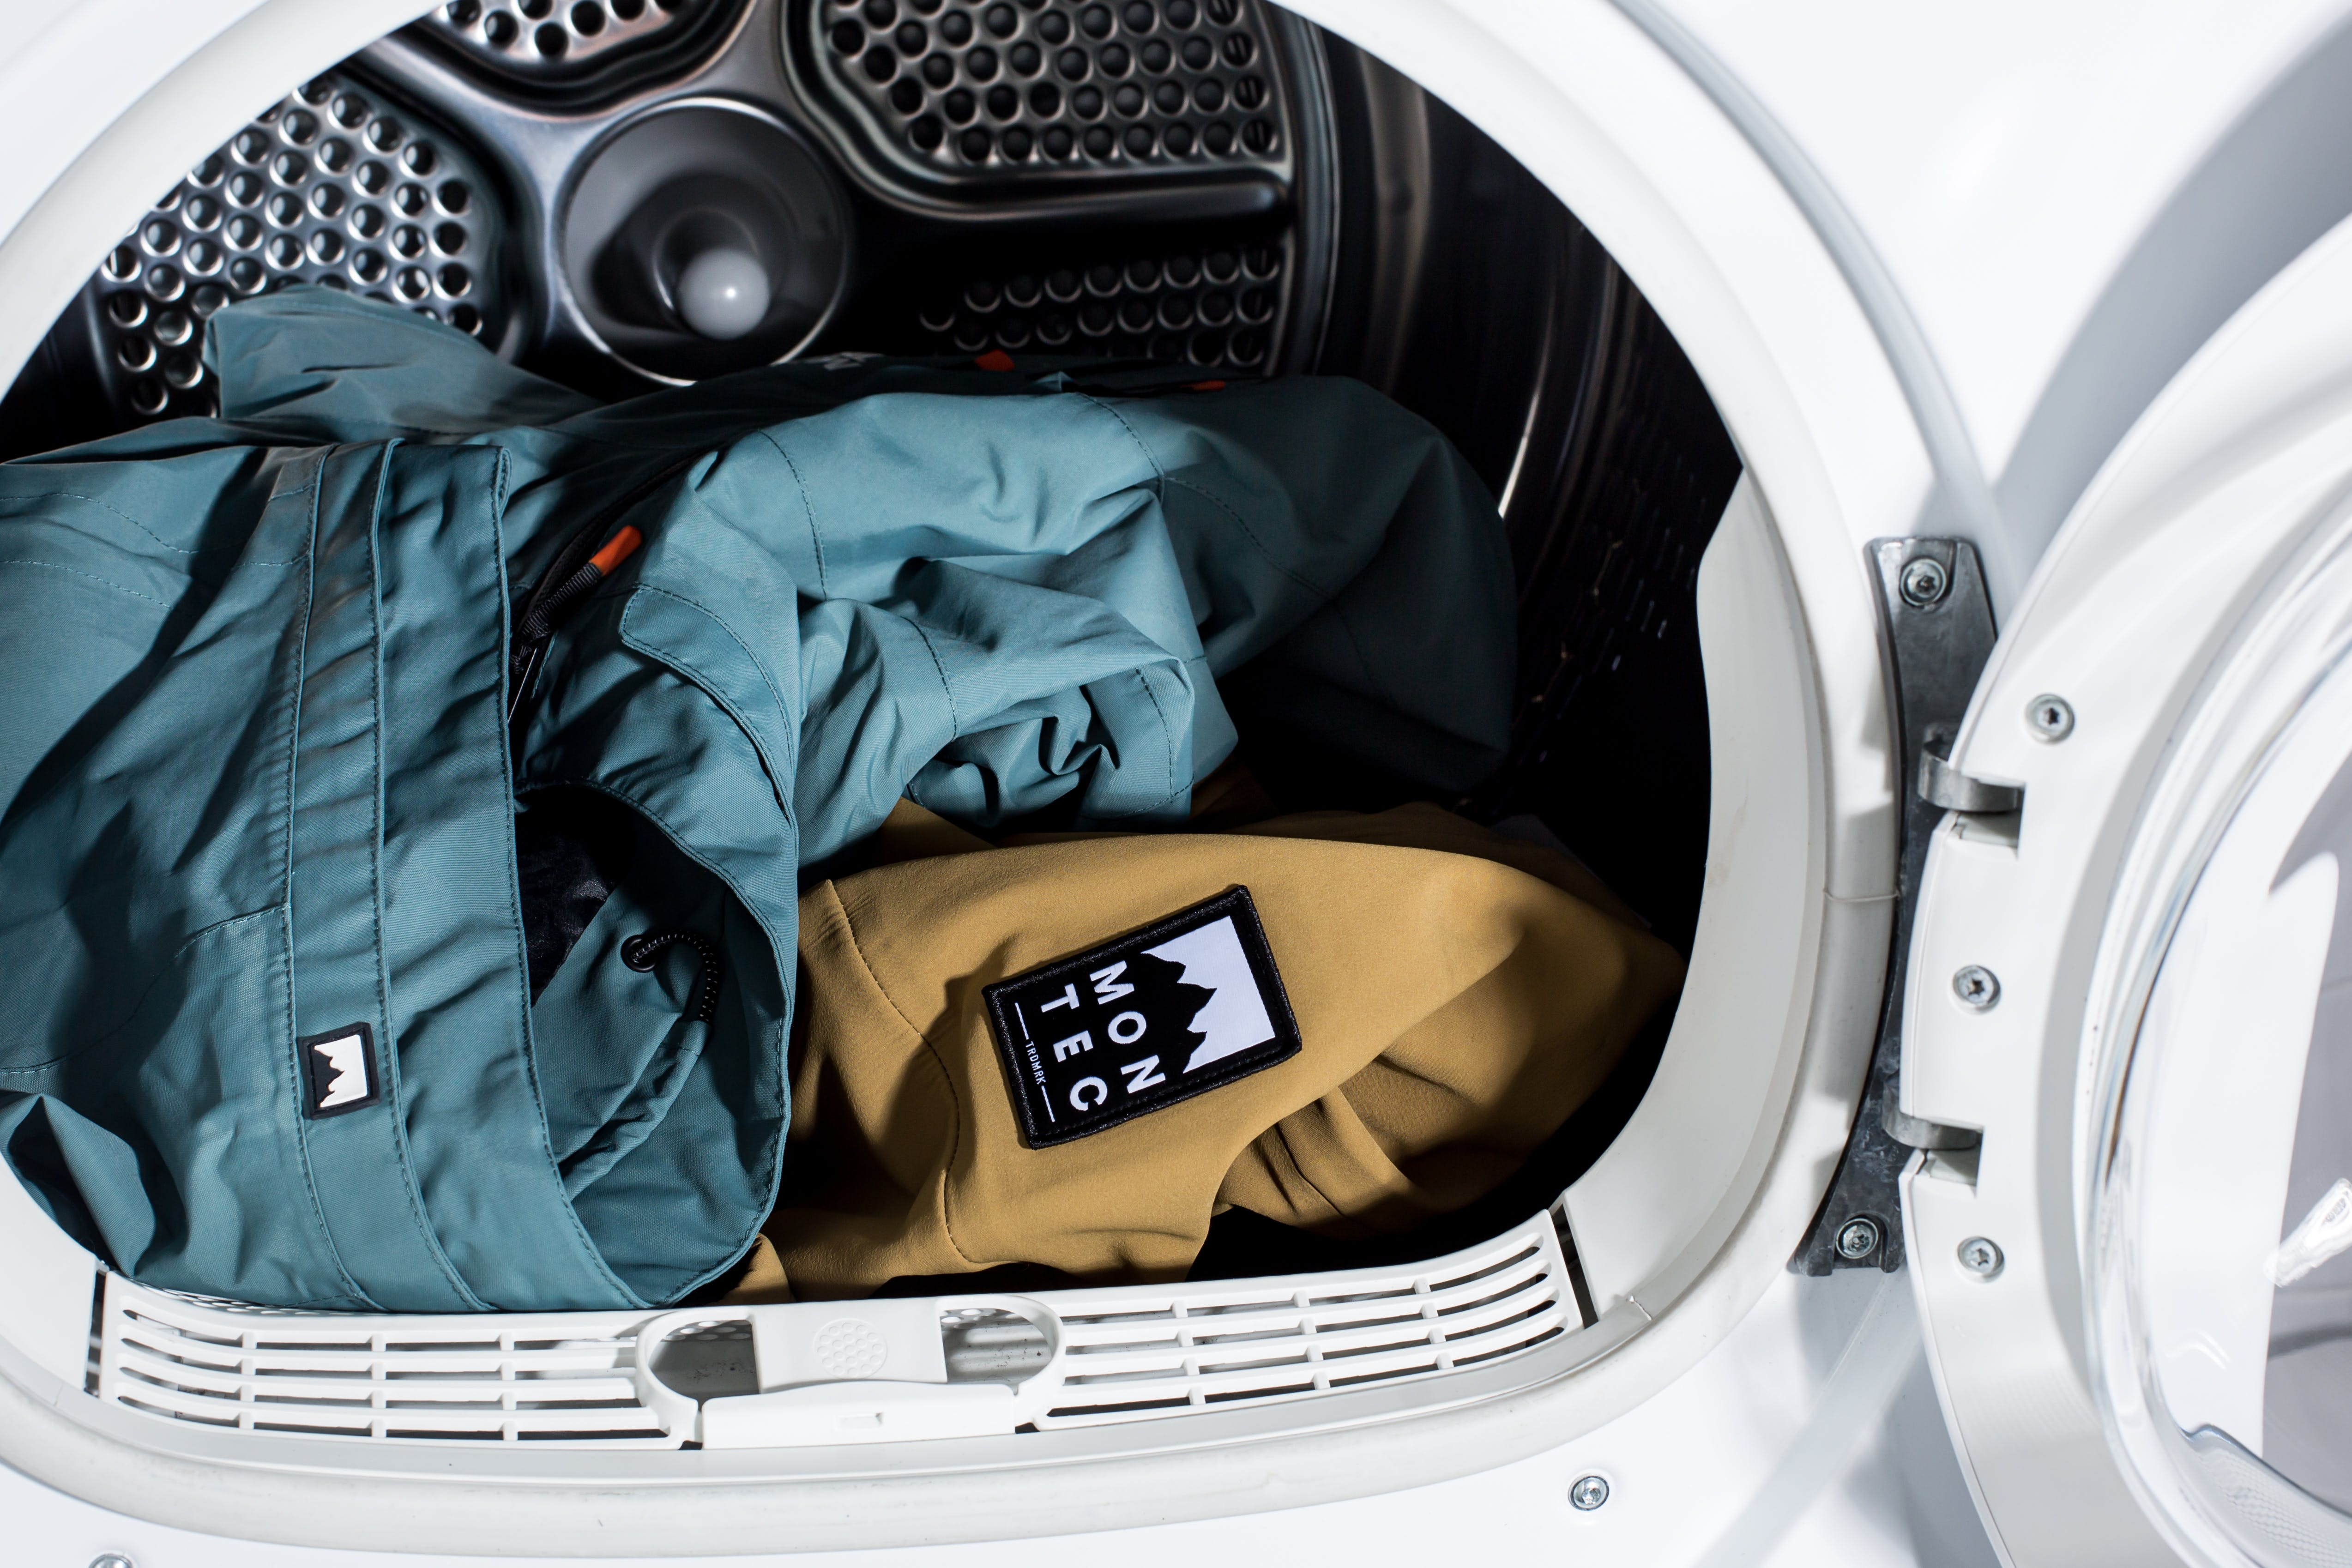 How To Wash Waterproof, Snowboard, and Ski Jackets/Pants